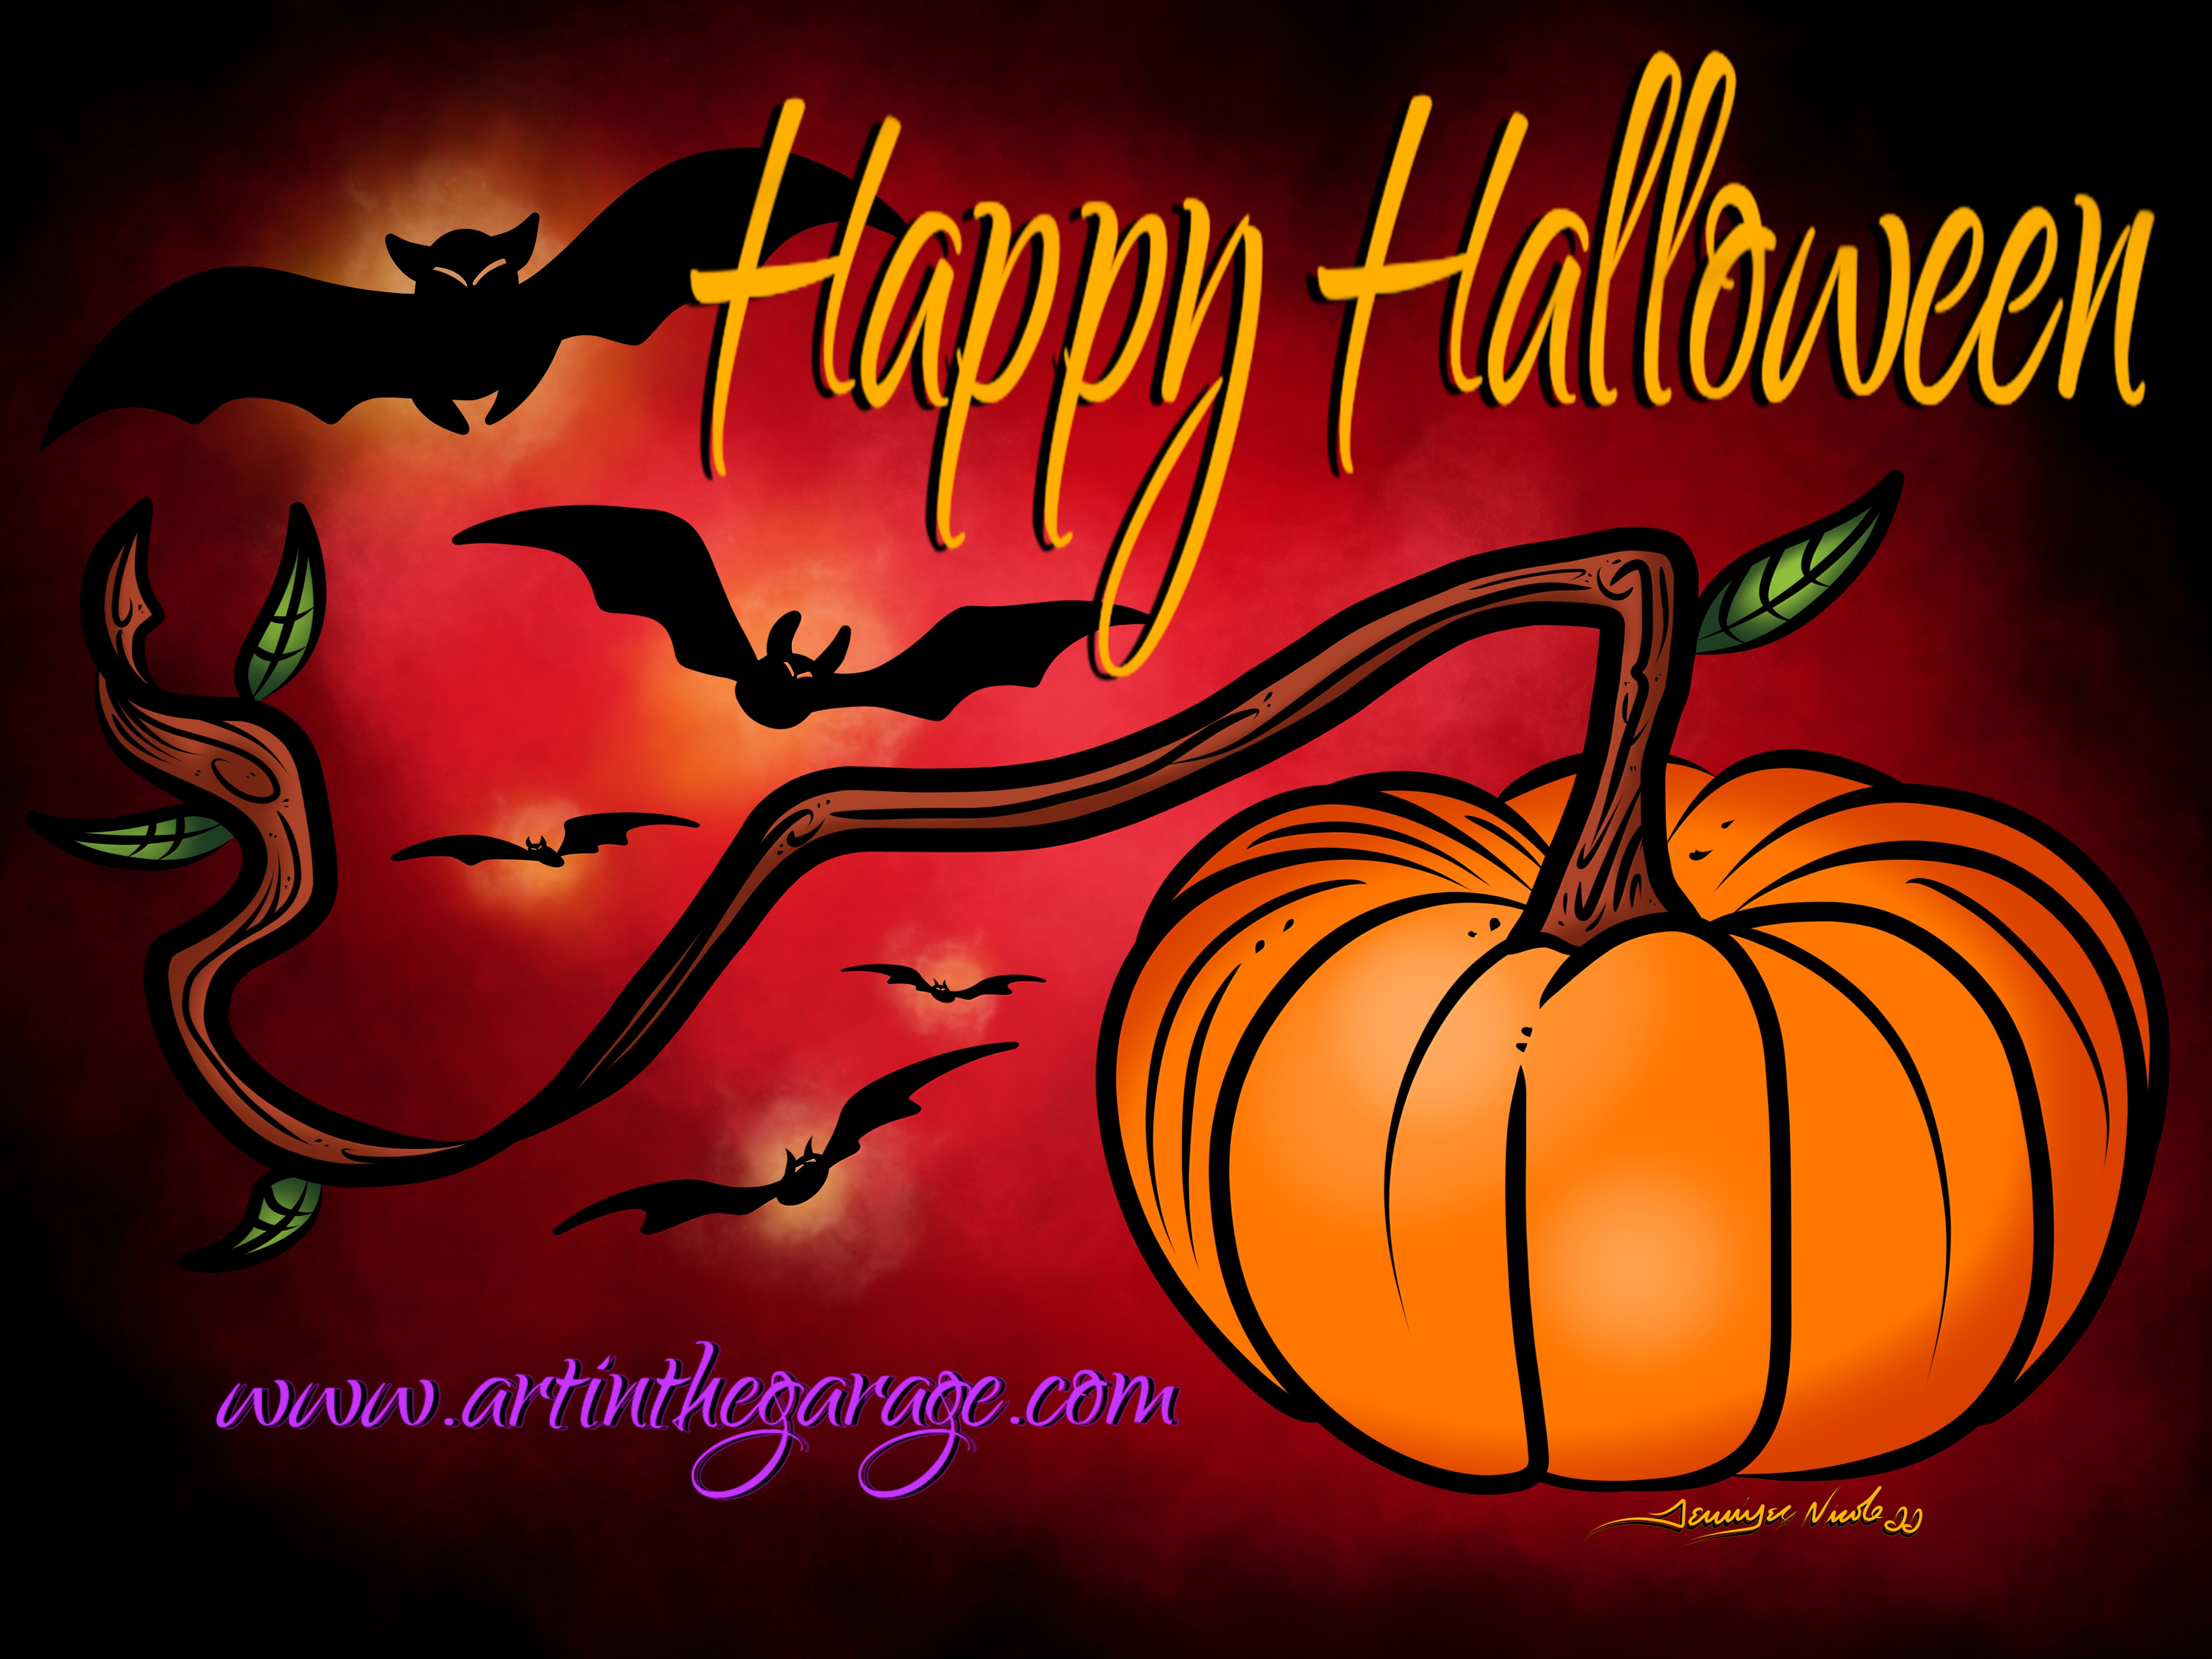 10-31-15 Happy Halloween